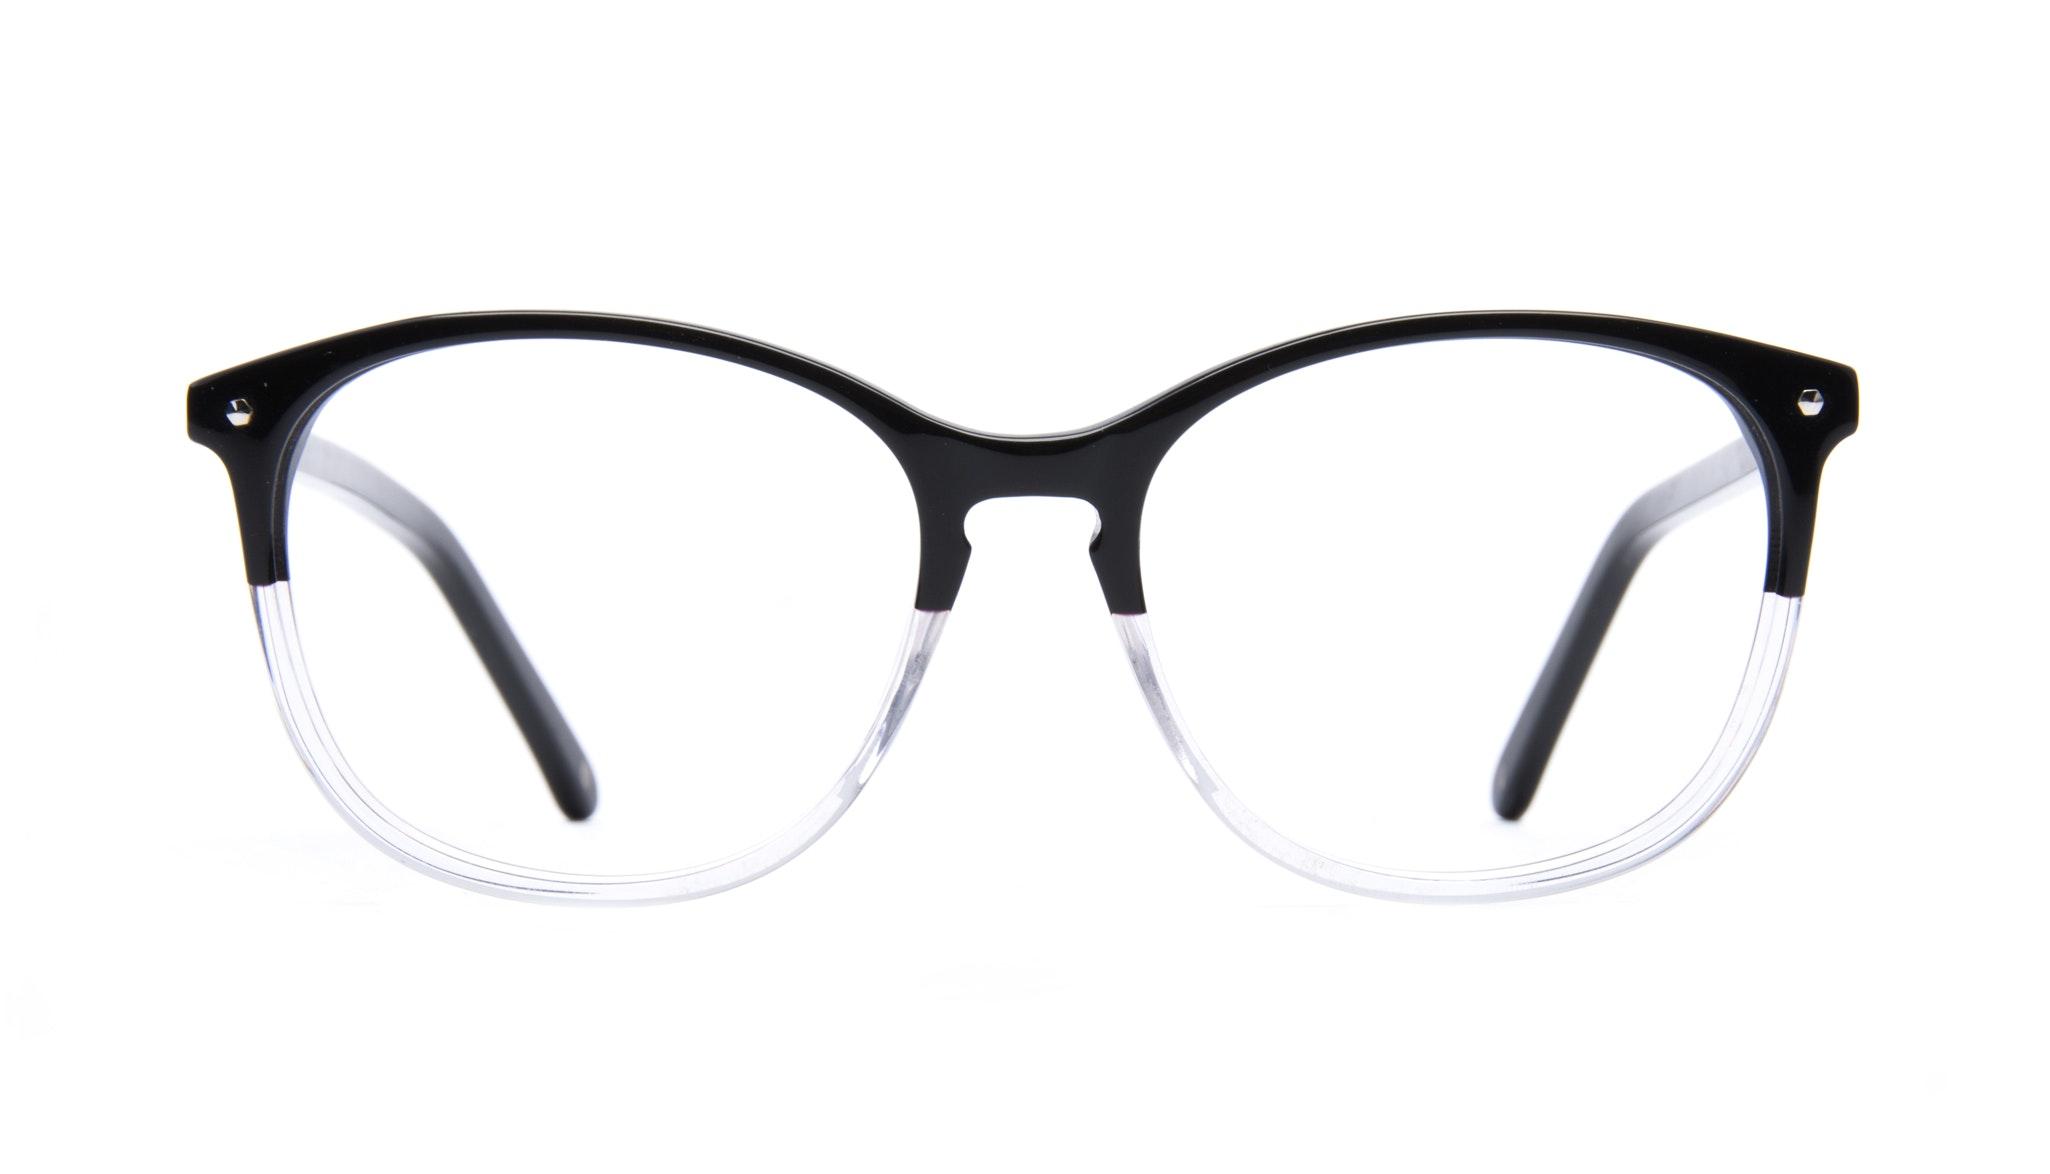 Affordable Fashion Glasses Rectangle Round Eyeglasses Women Nadine Two Tone Black Front